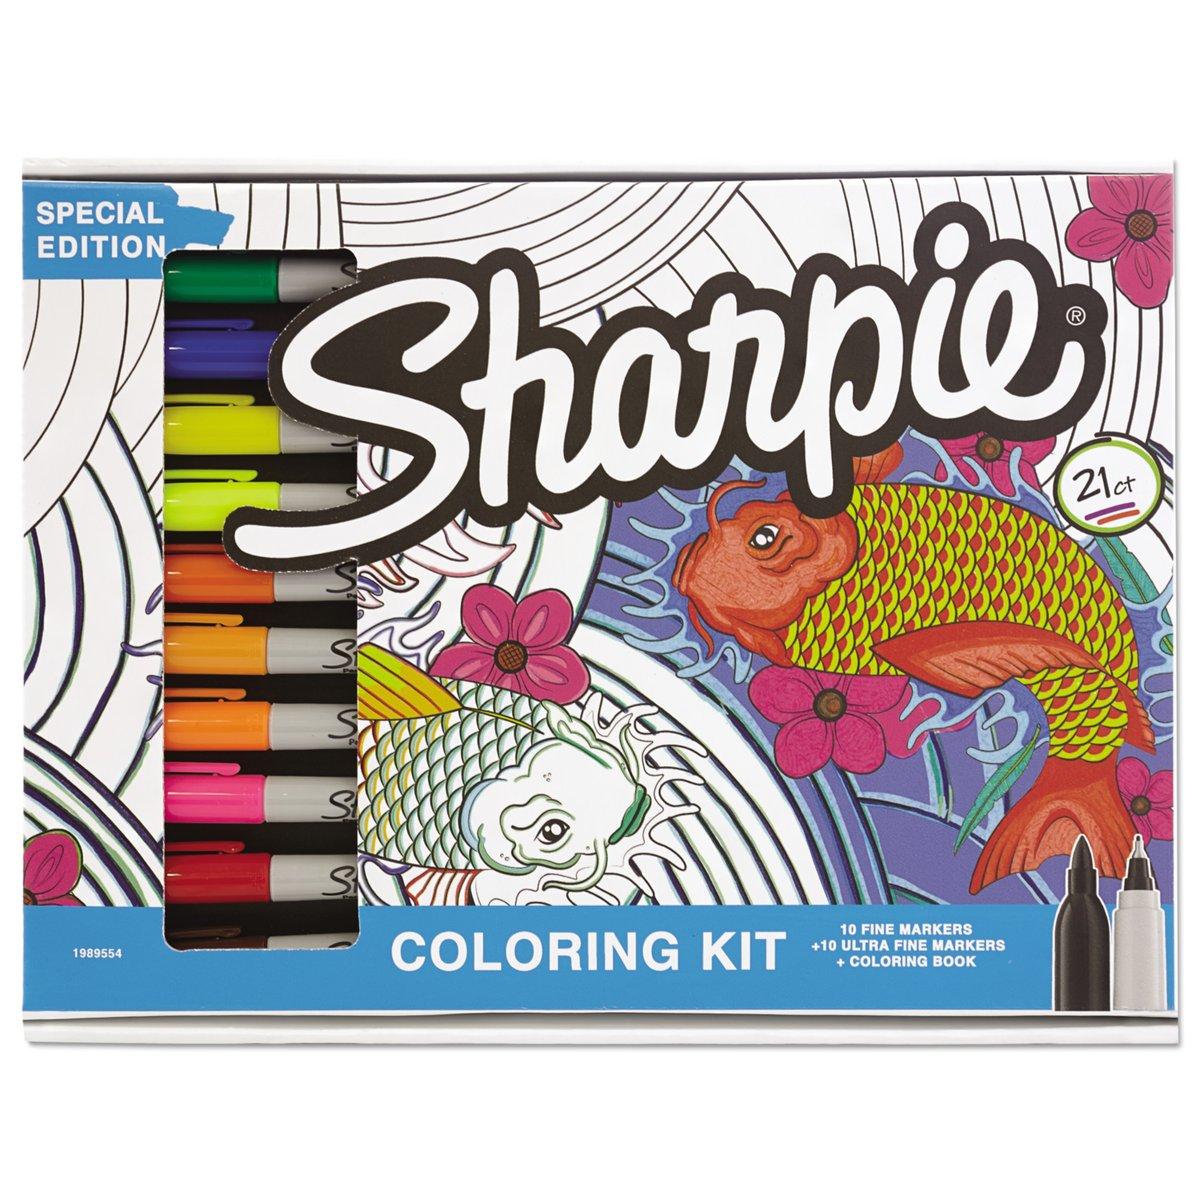 80% Off!!  Sharpie Deep Sea Color Collection Coloring Kit  https://goto.walmart.com/c/1952026/565706/9383?veh=aff&sourceid=imp_000011112222333344&u=https%3A%2F%2Fwww.walmart.com%2Fip%2FSharpie-Deep-Sea-Color-Collection-Coloring-Kit%2F53720331…  #BwcDeals #dailydeals #DealsAndSteals #TEACHerspic.twitter.com/z87mGcEInW